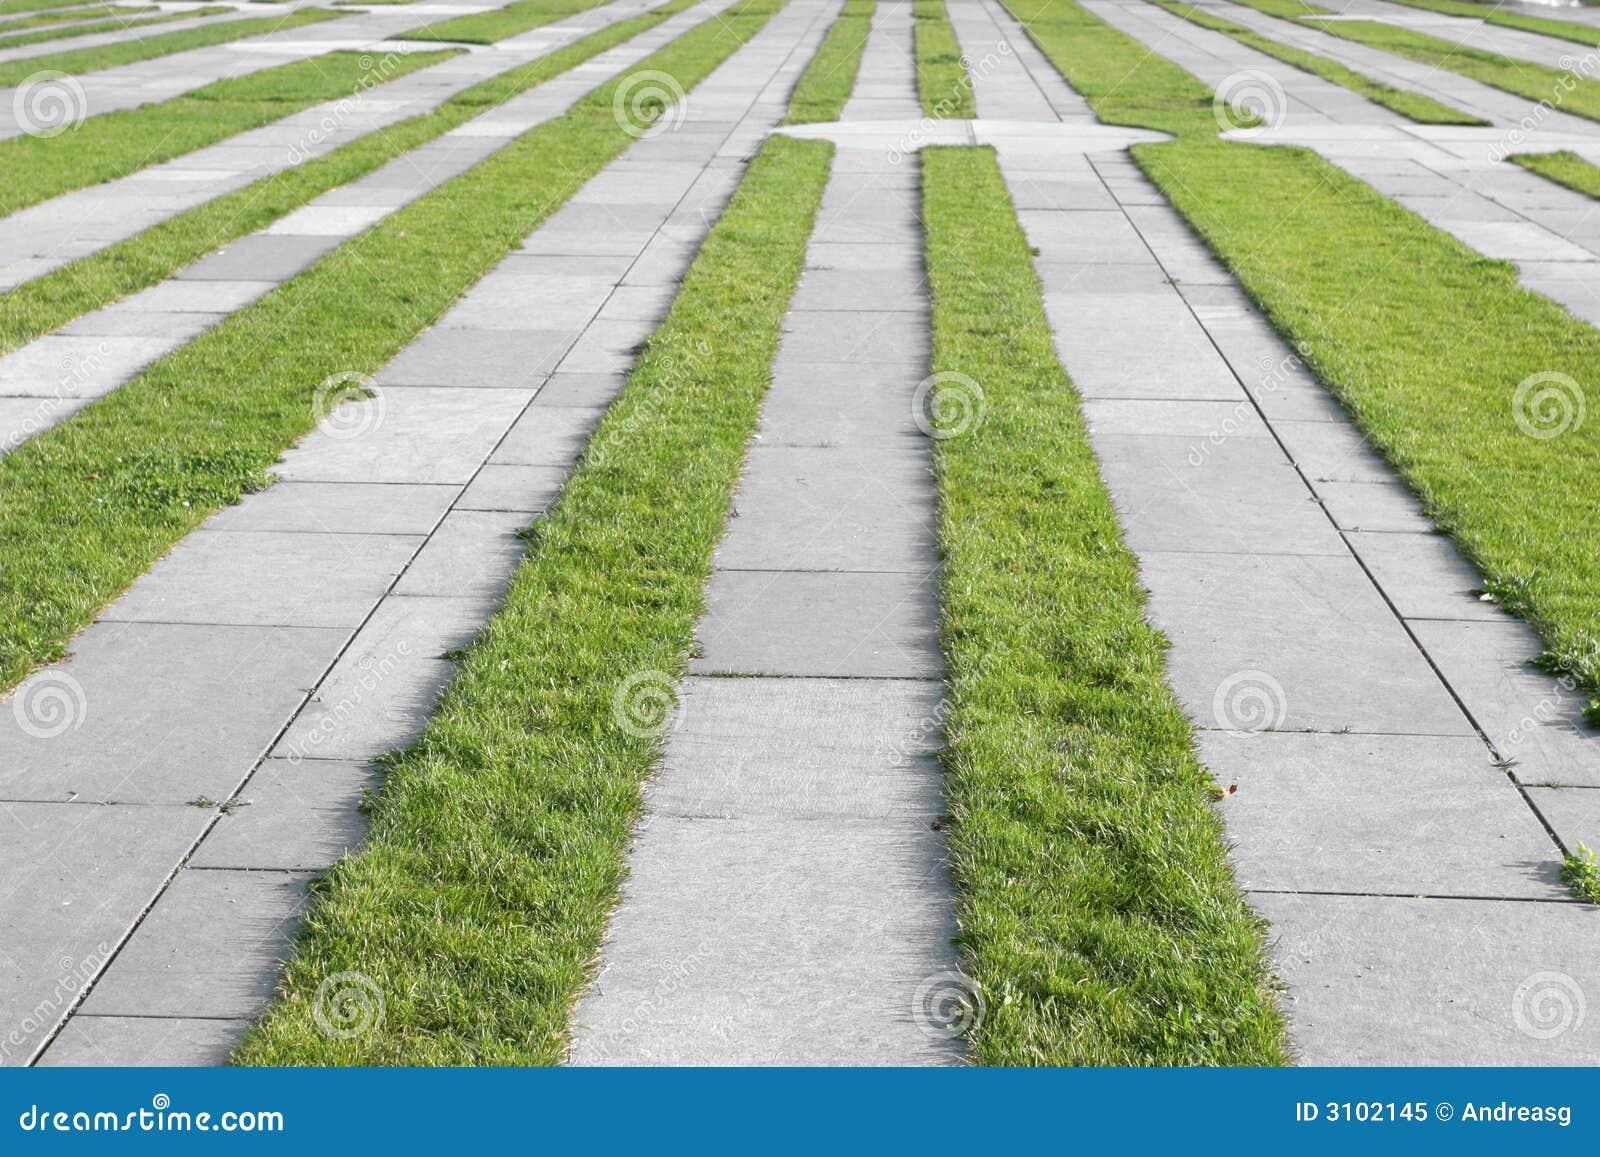 Grass Pavement Strips Royalty Free Stock Photo Image